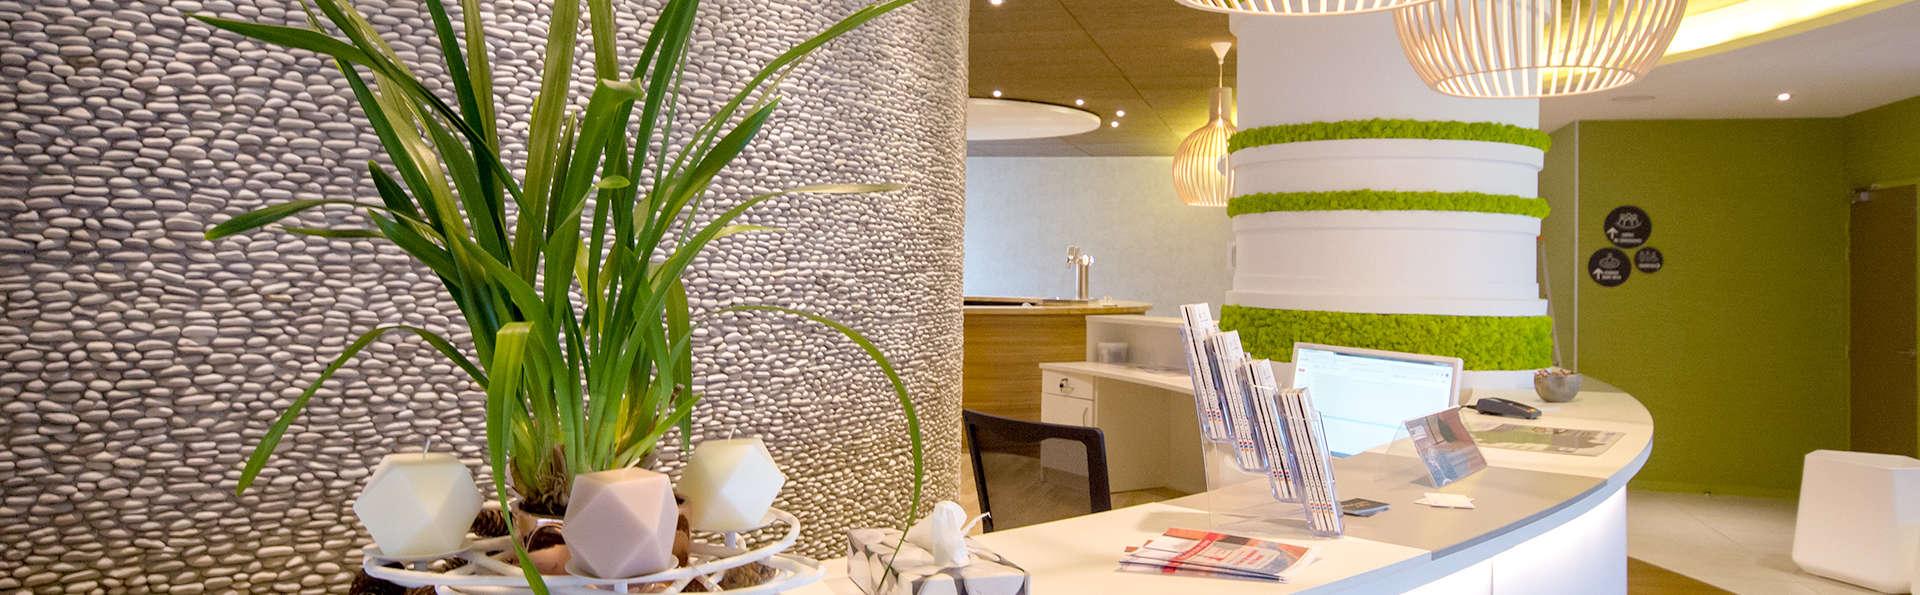 Brit Hôtel Saint-Brieuc Plérin - Edit_Reception.jpg